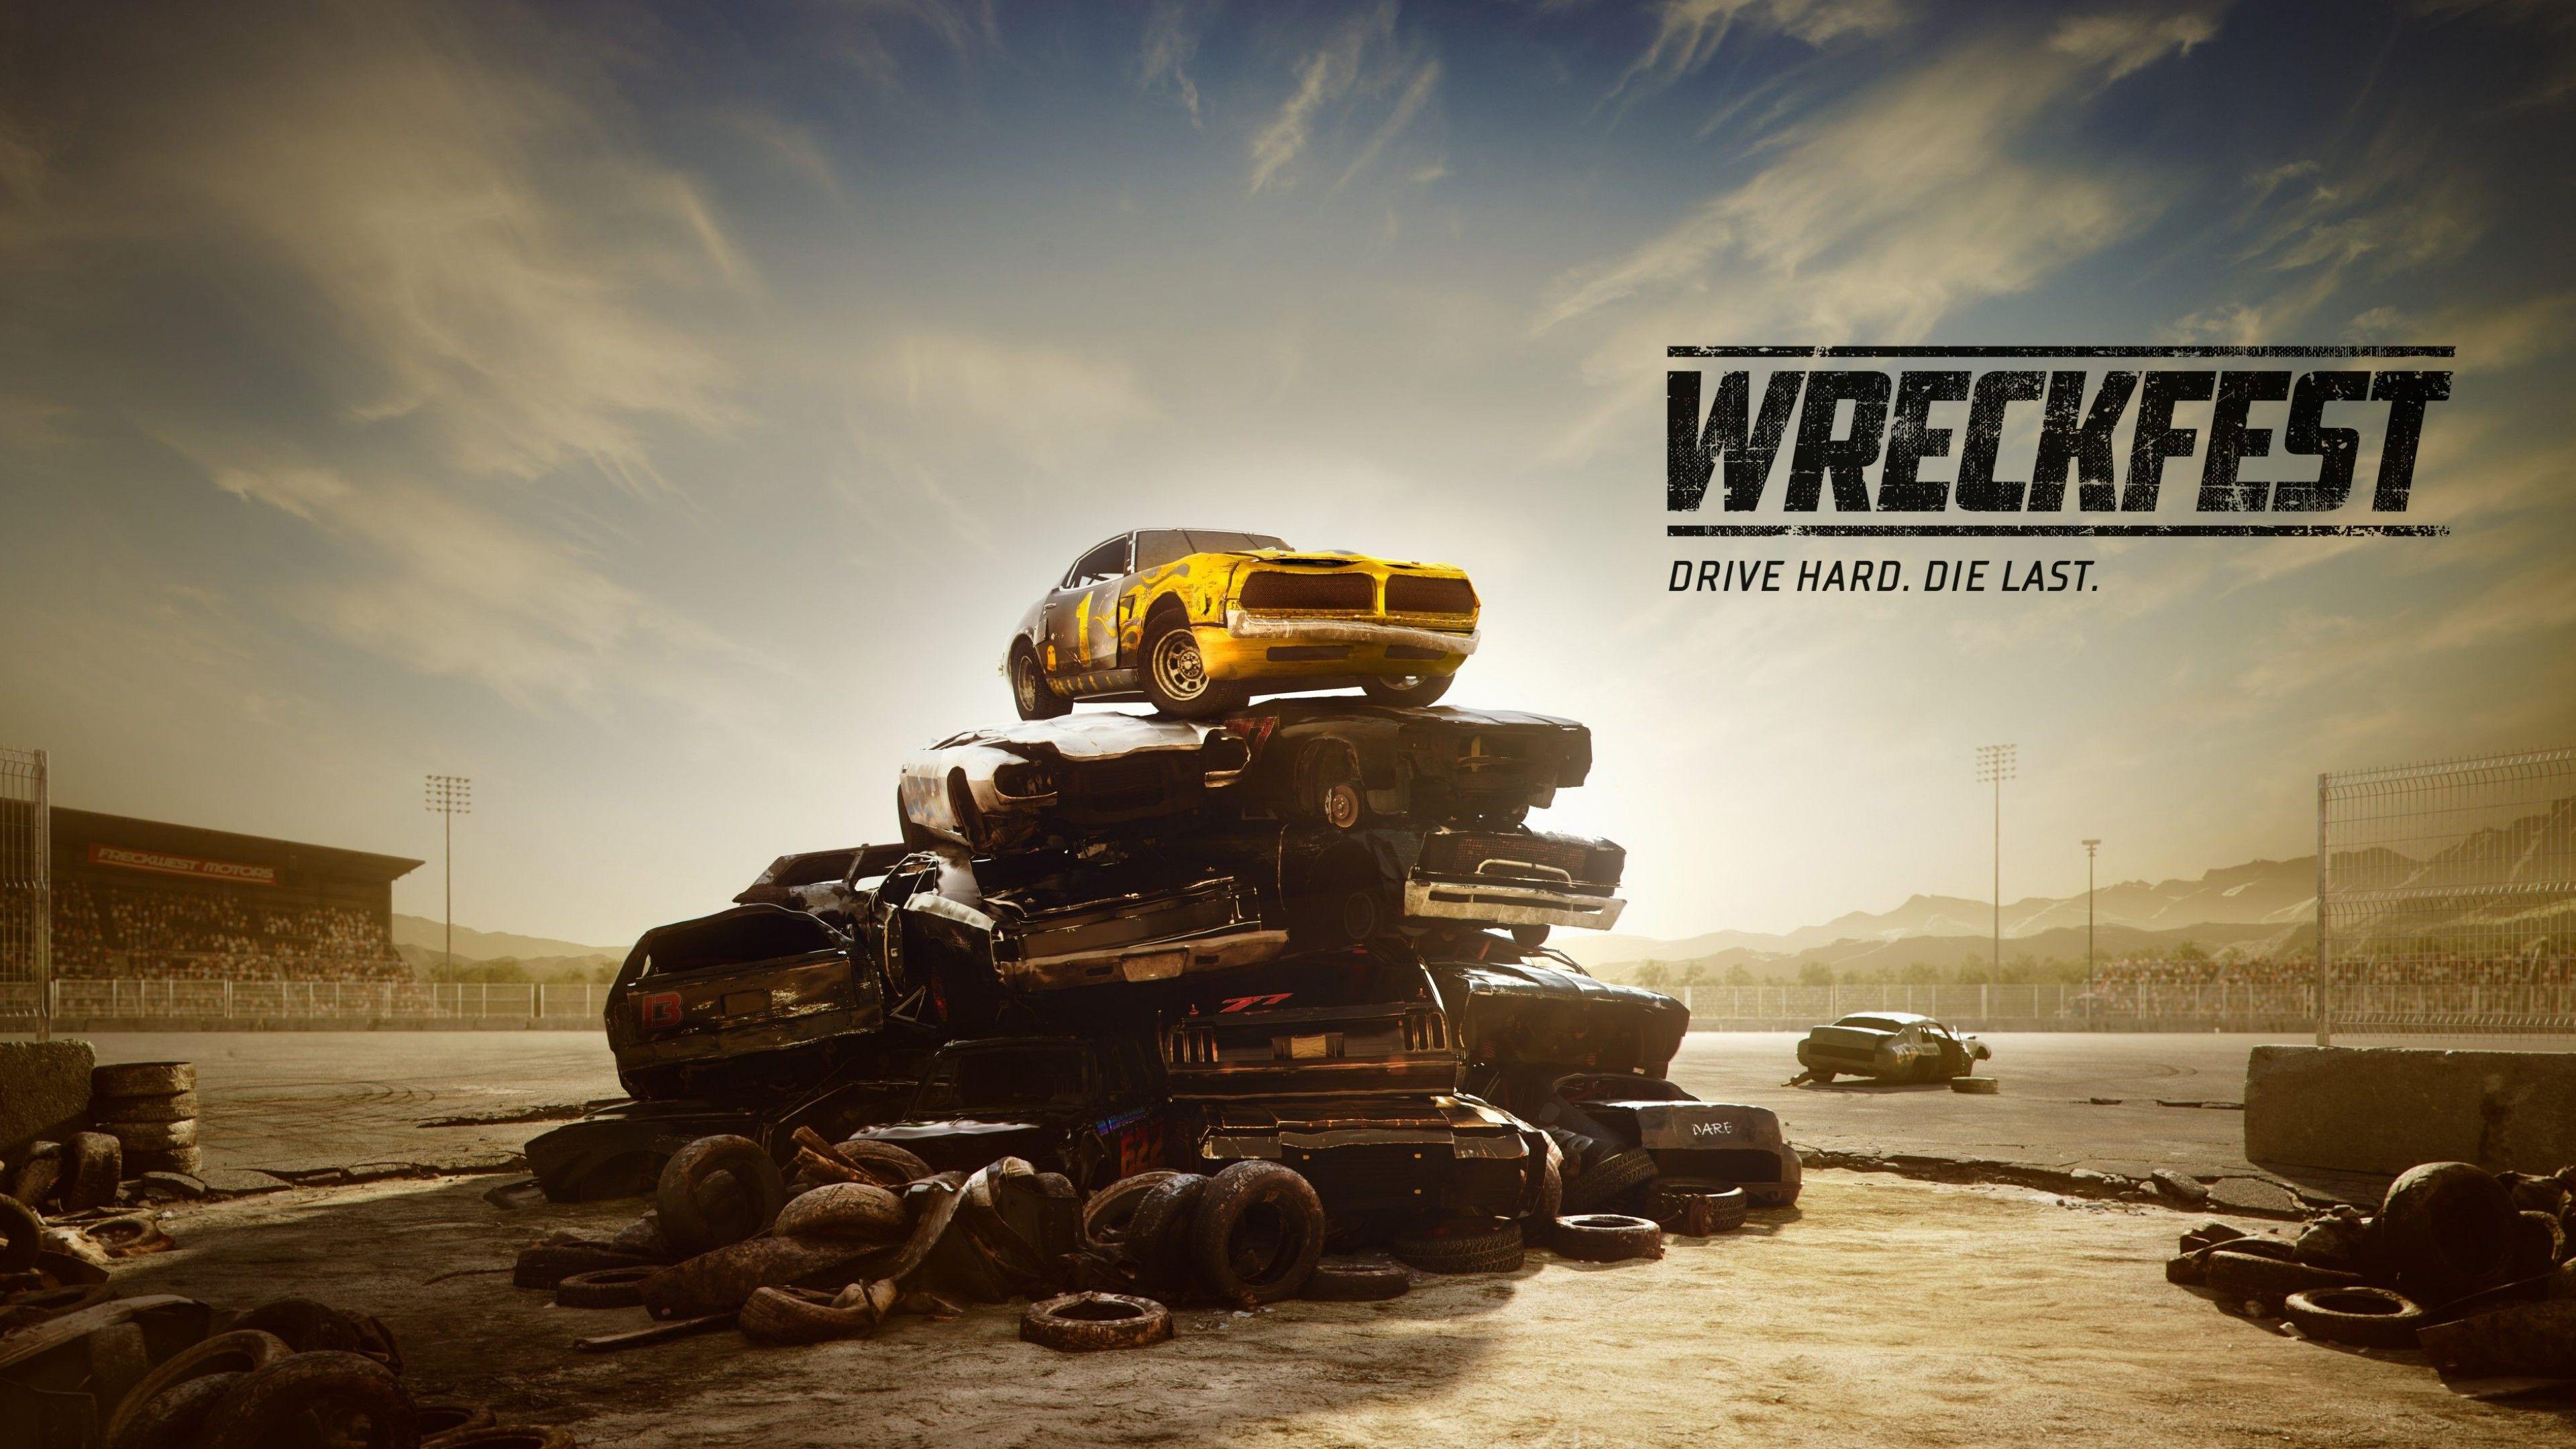 wreckfest game background wallpaper 69657